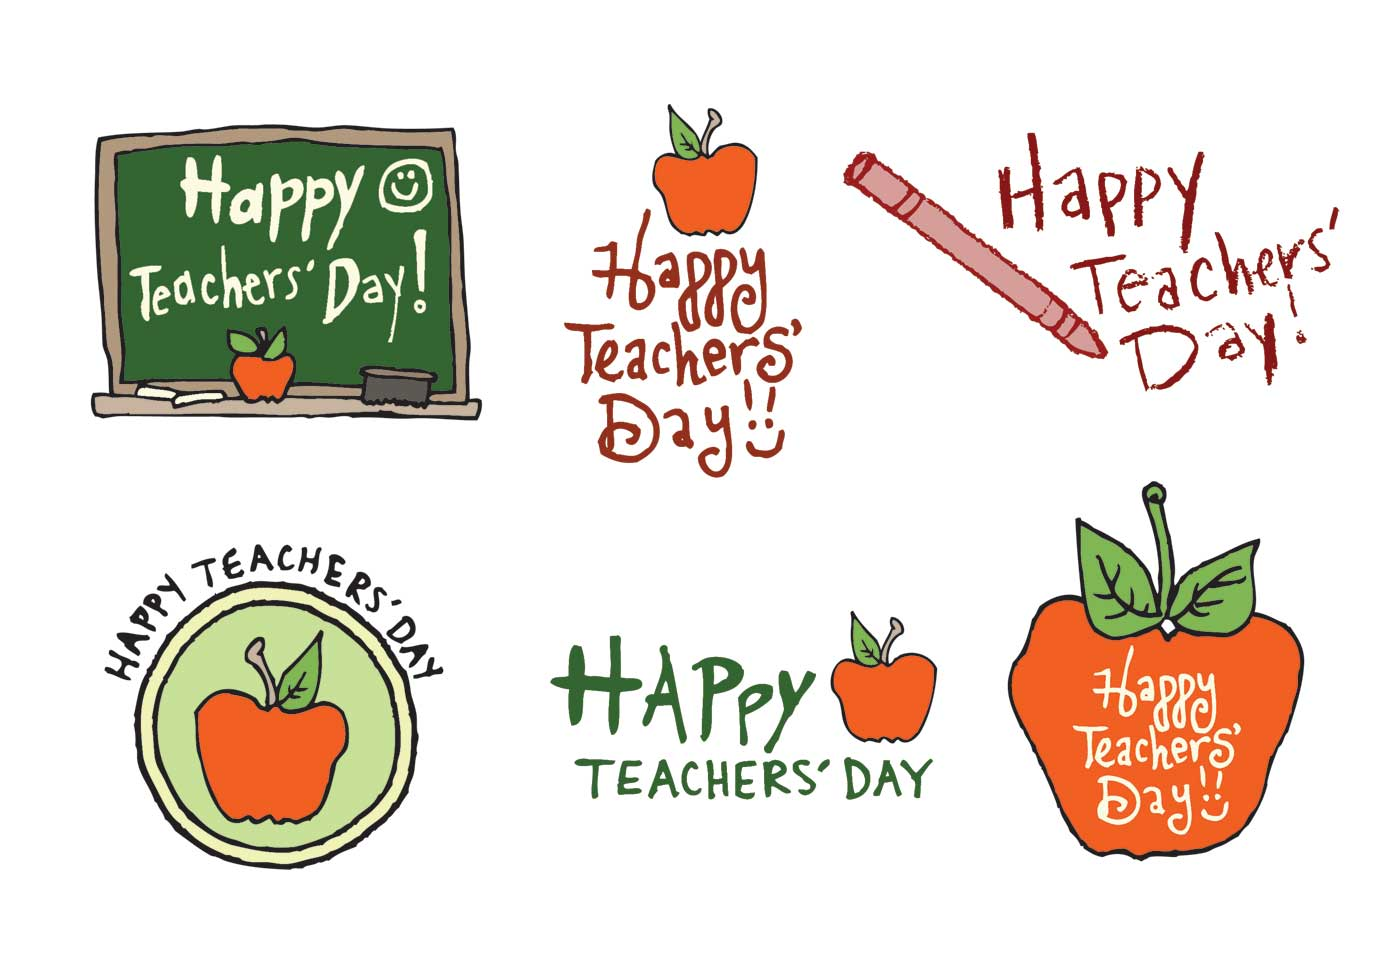 clipart for teachers day - photo #39